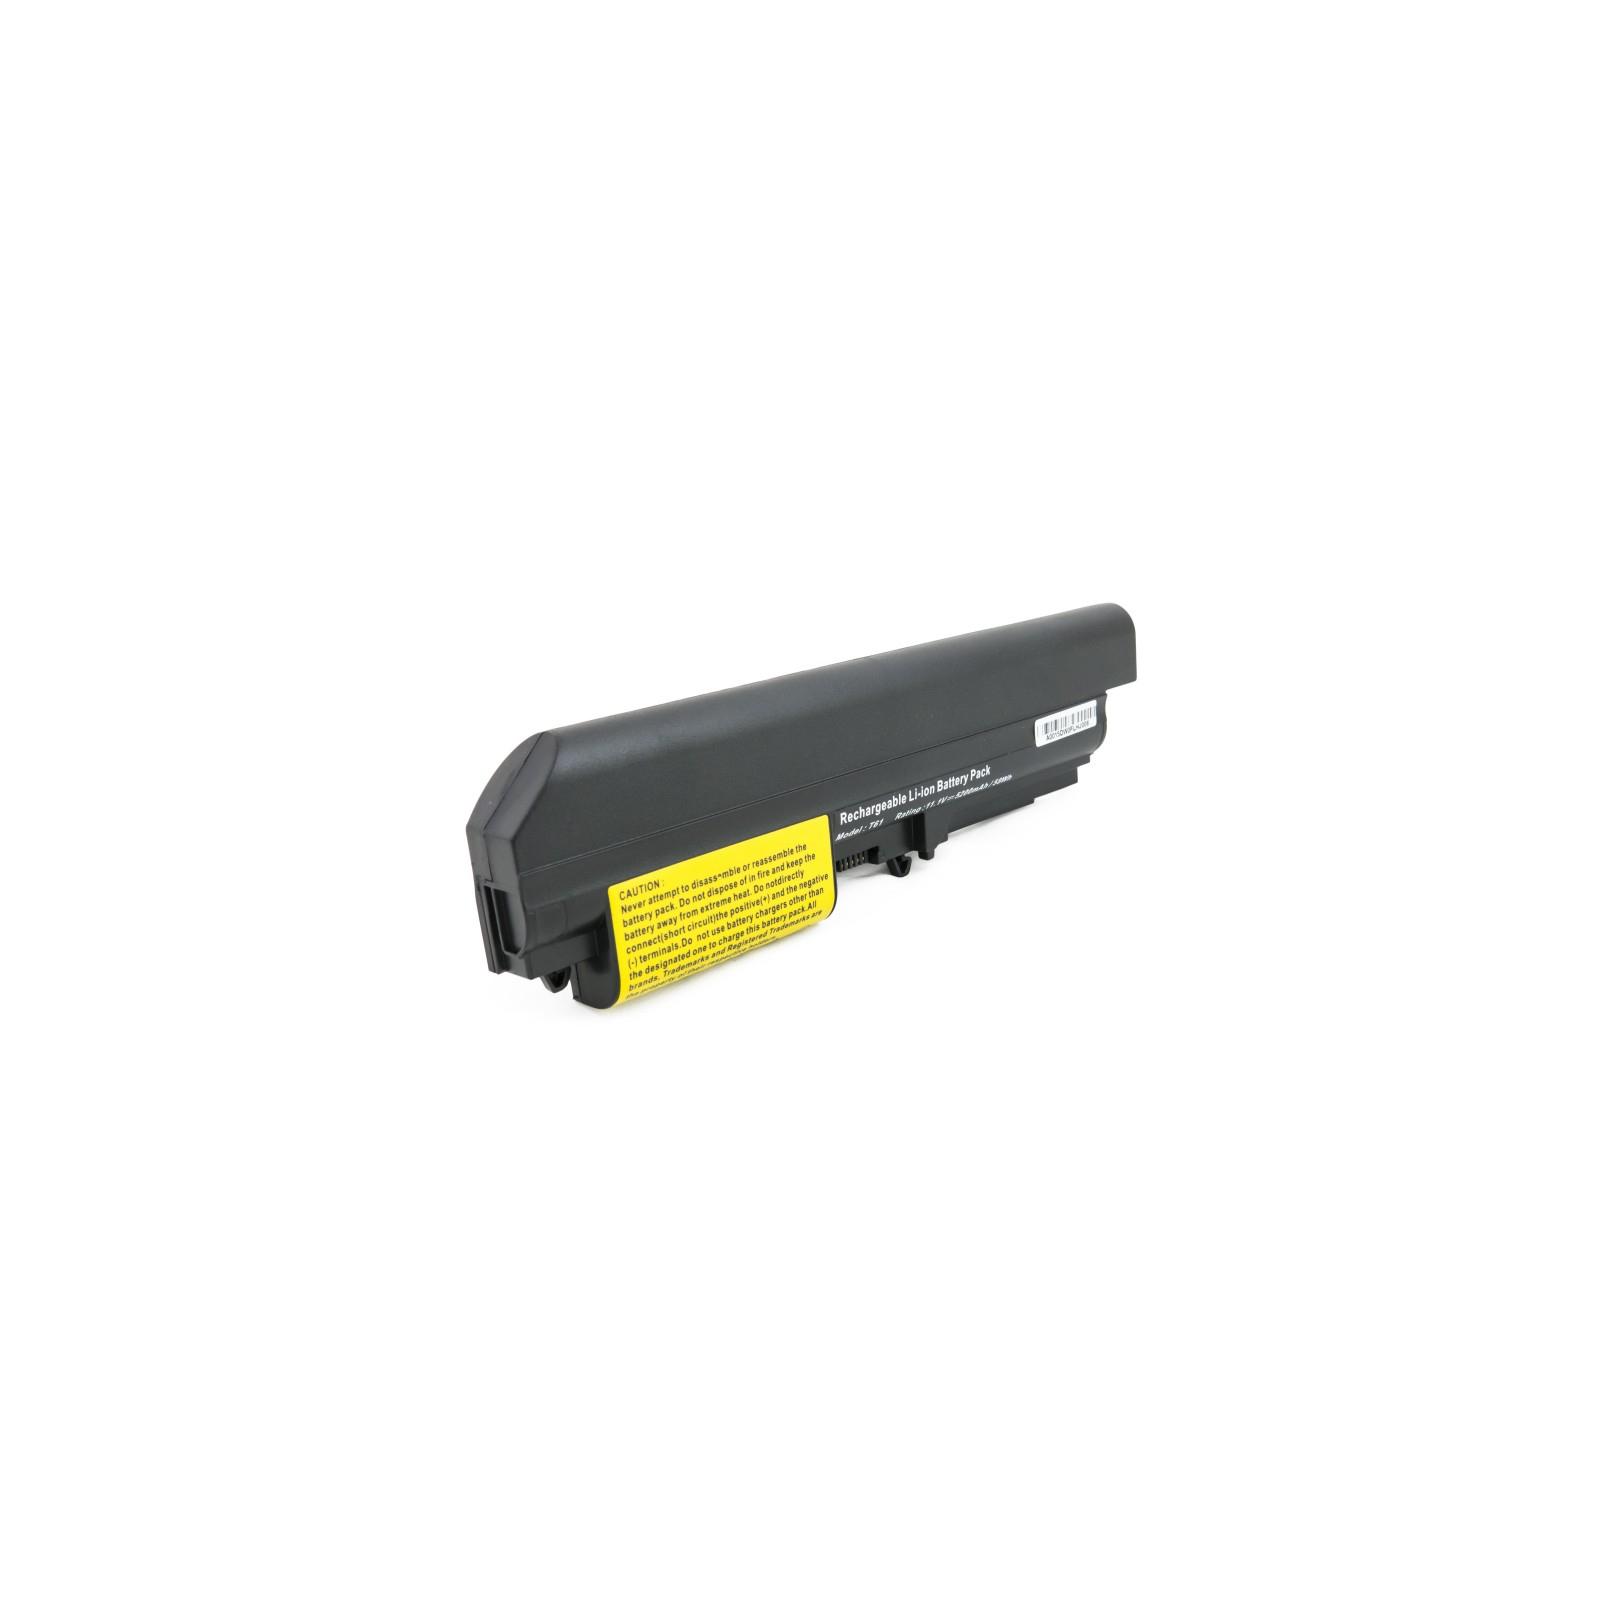 Аккумулятор для ноутбука Lenovo T61 5200 mAh EXTRADIGITAL (BNL3952)